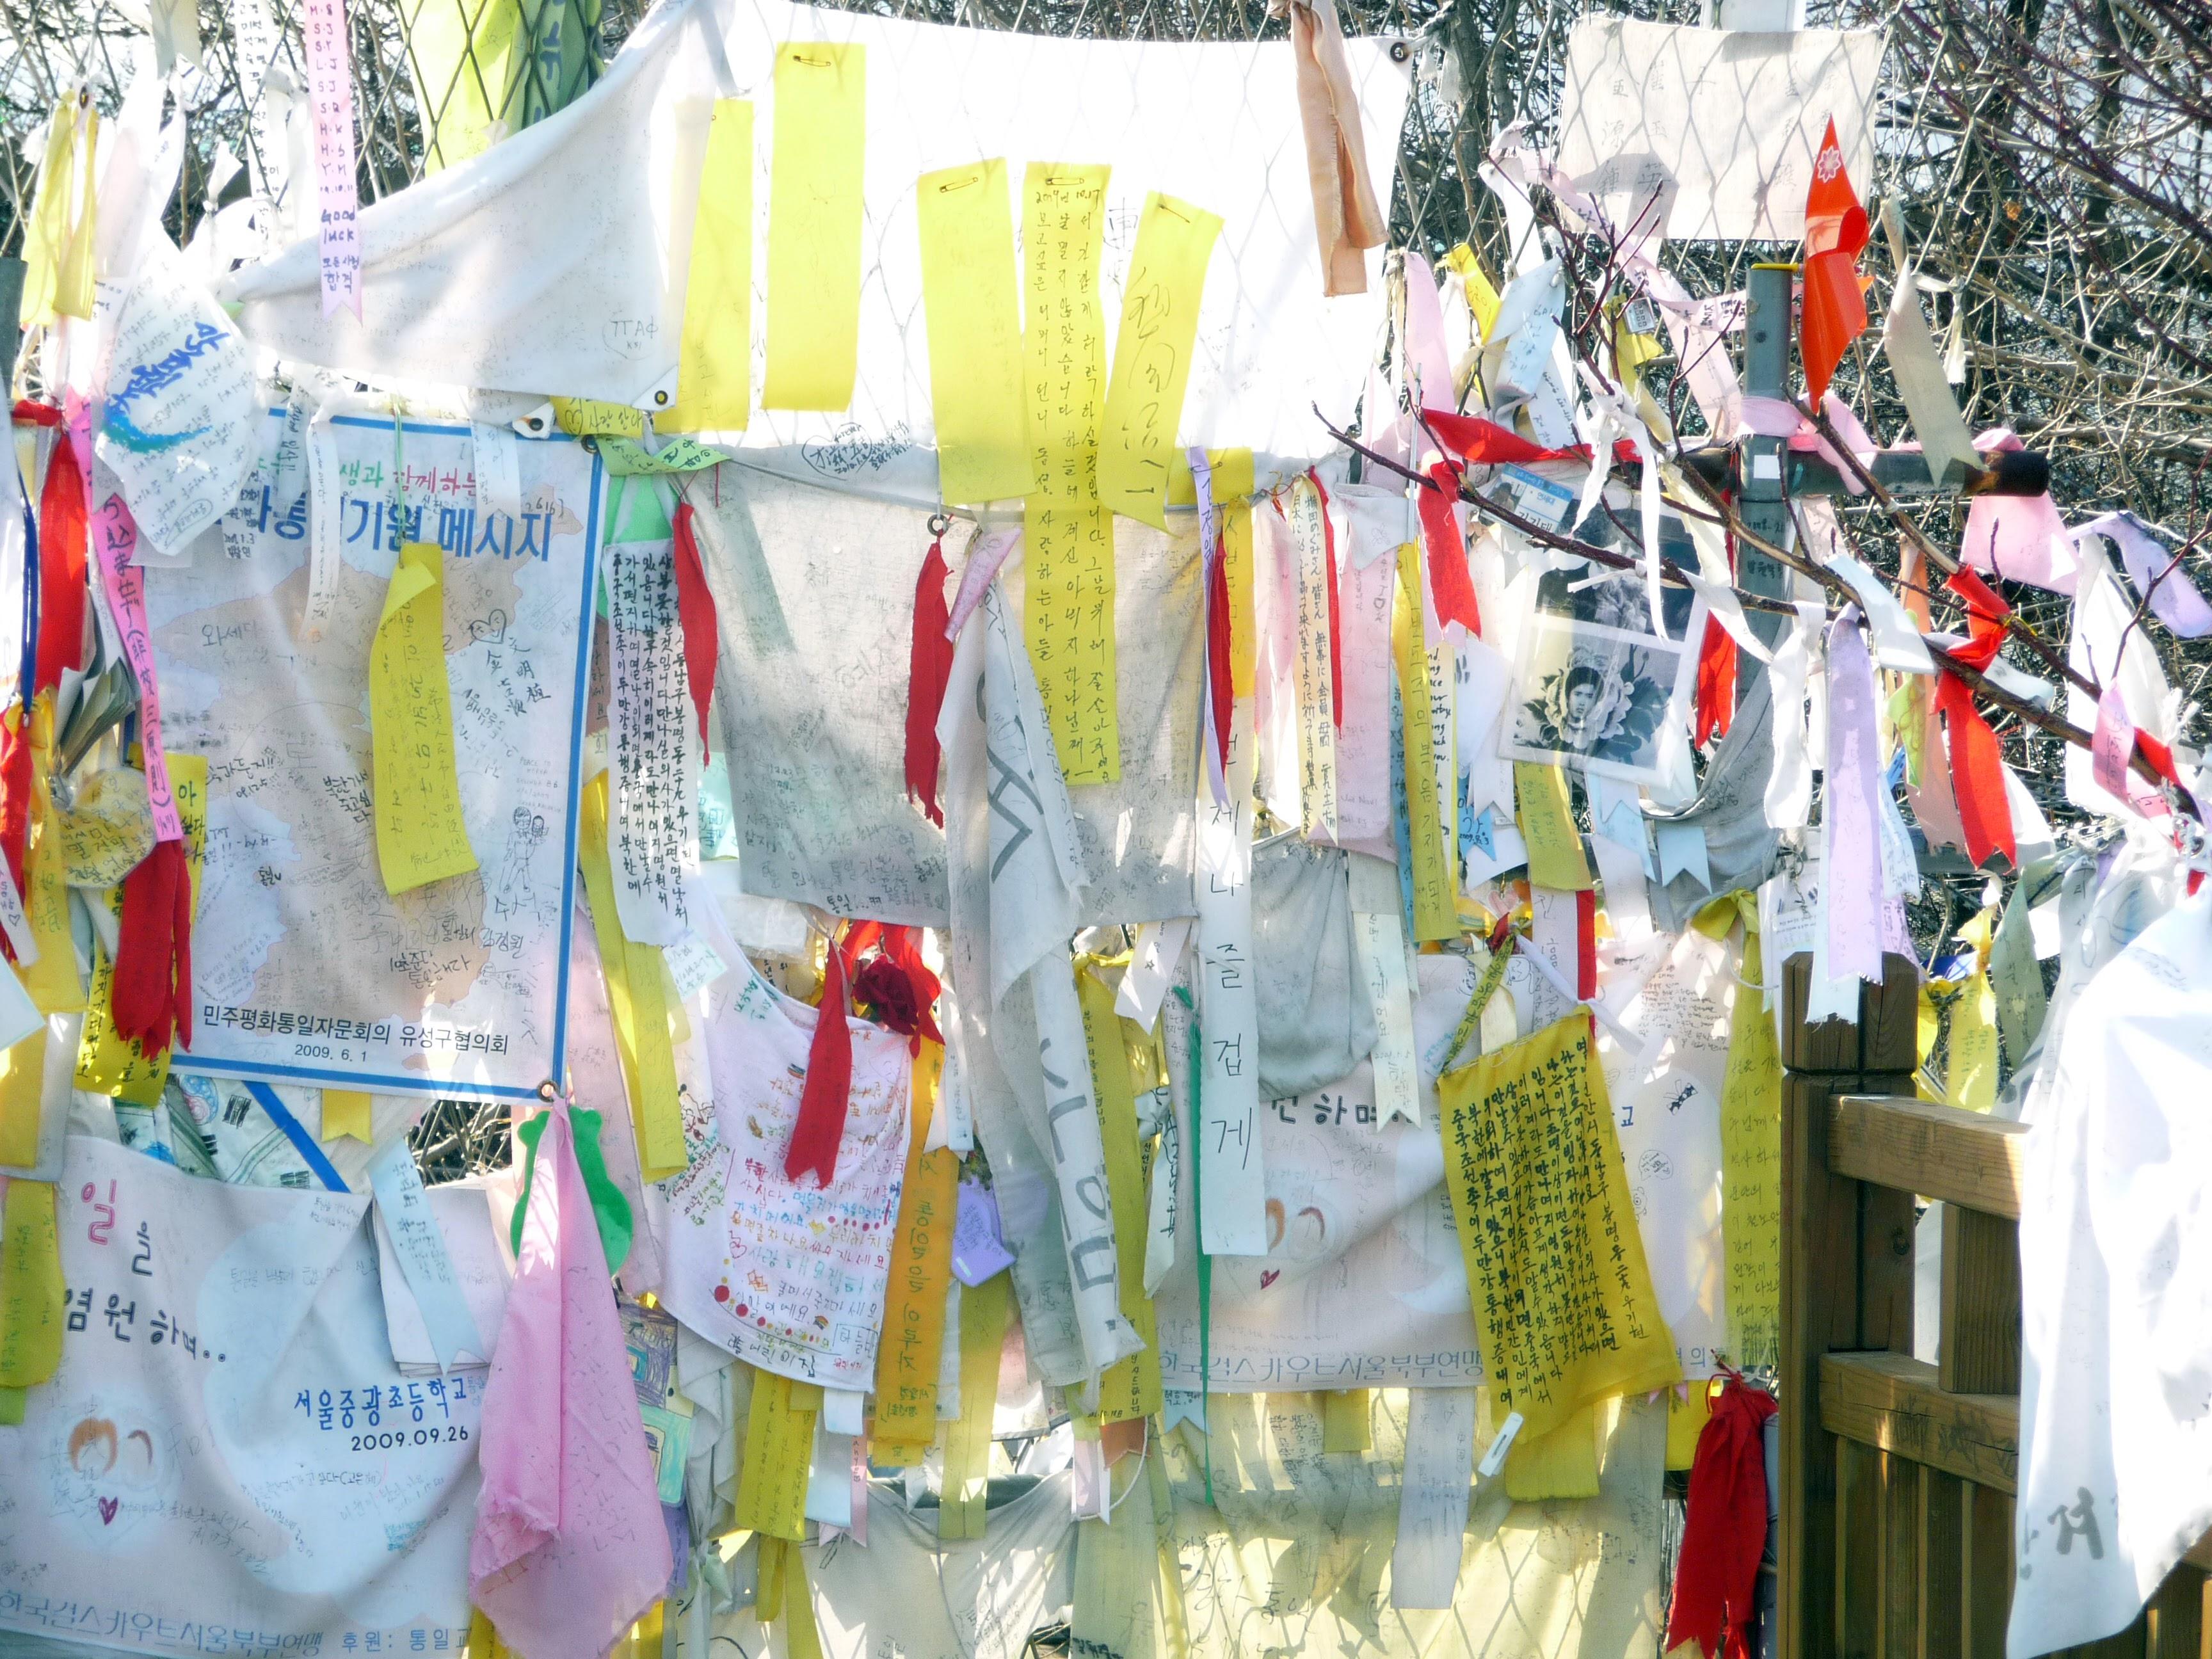 Prayers left for loved ones at Freedom Bridge